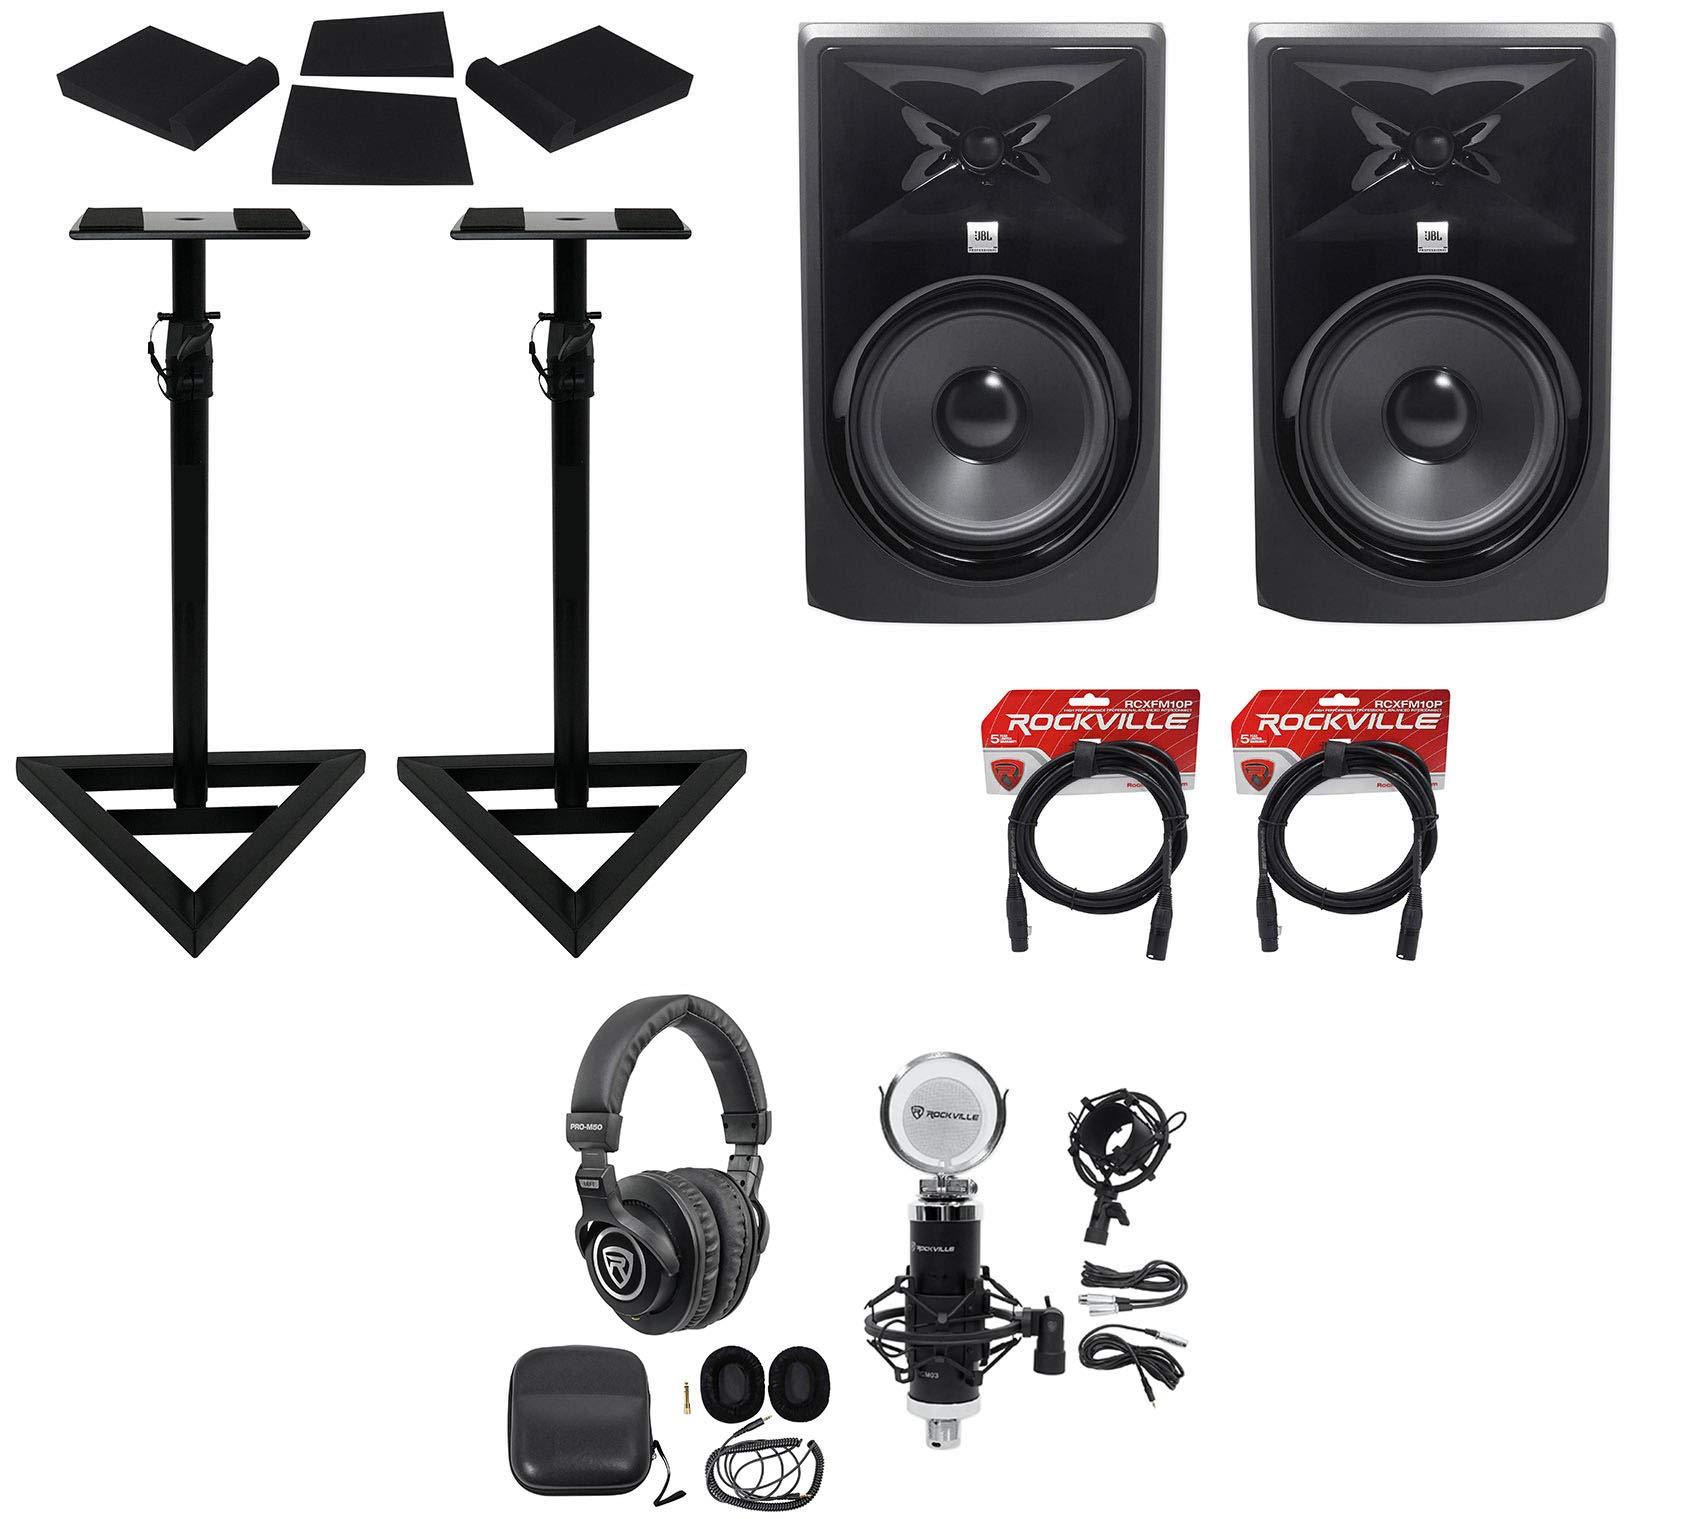 (2) JBL 308P MkII 8'' Powered Studio Monitors+Stands+Pads+Cables+Headphones+Mic